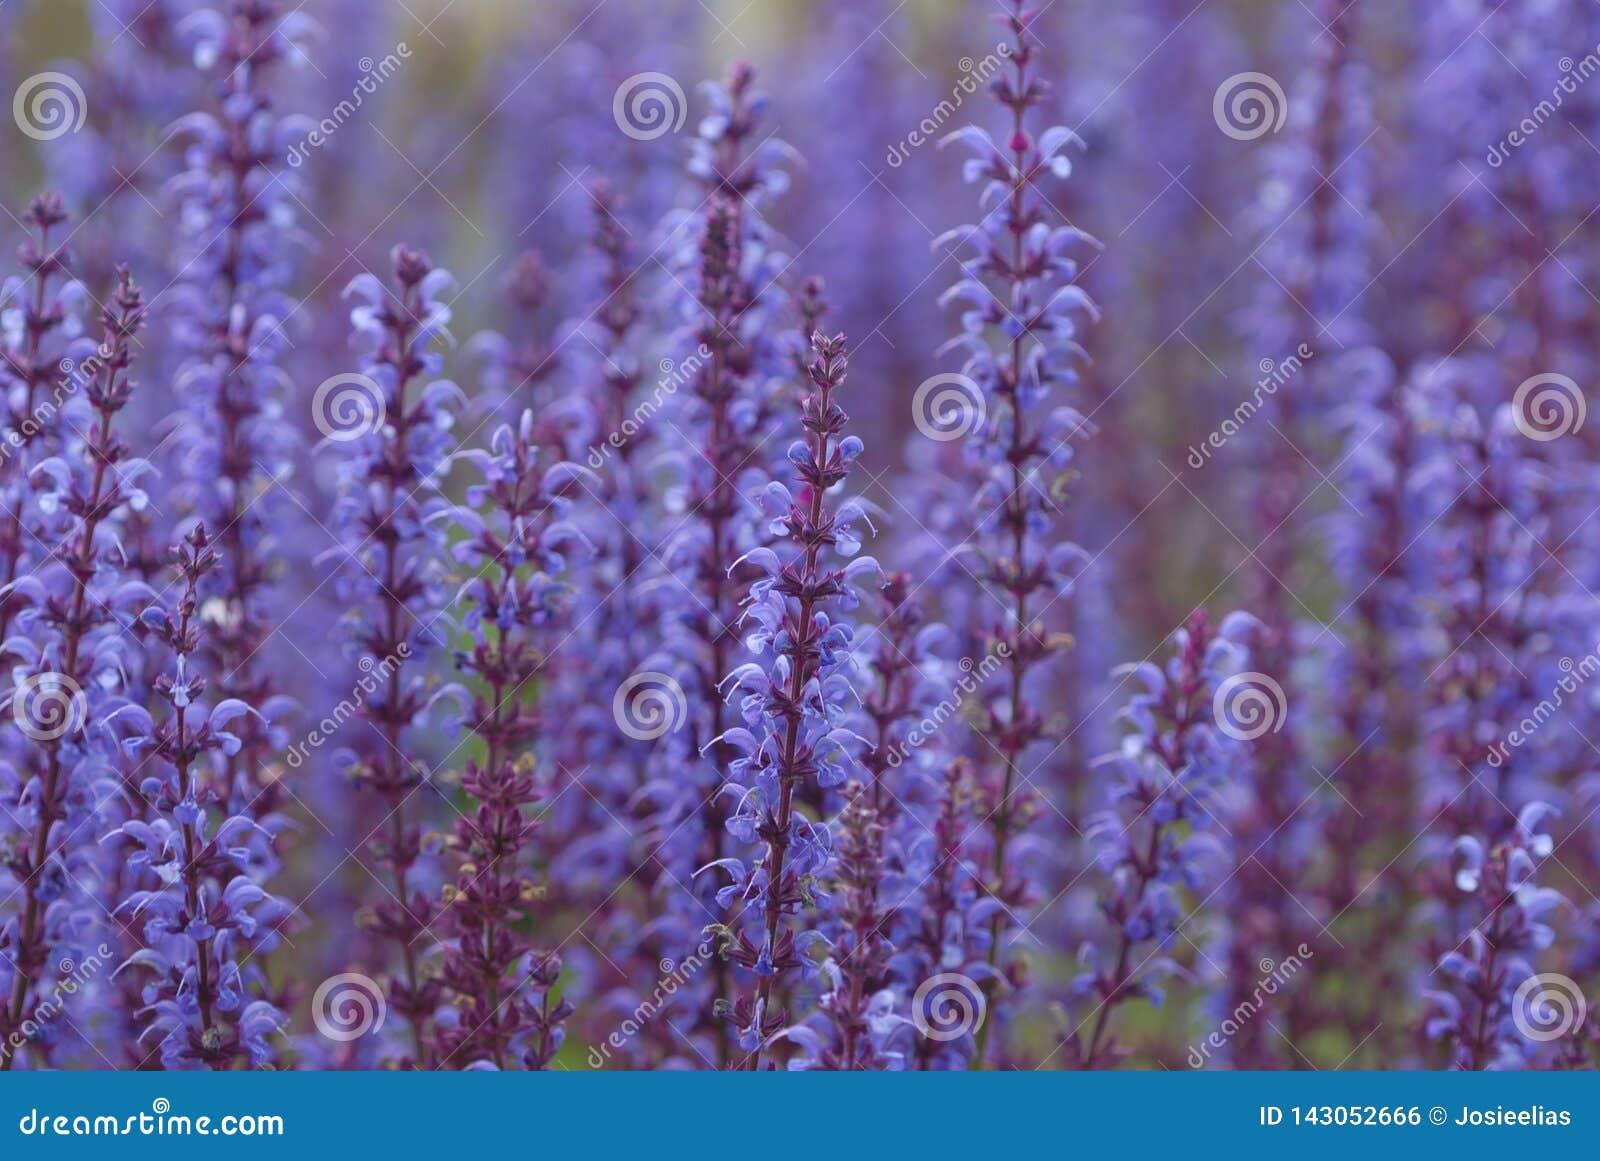 Puntos hermosos de las flores púrpuras, foco selectivo